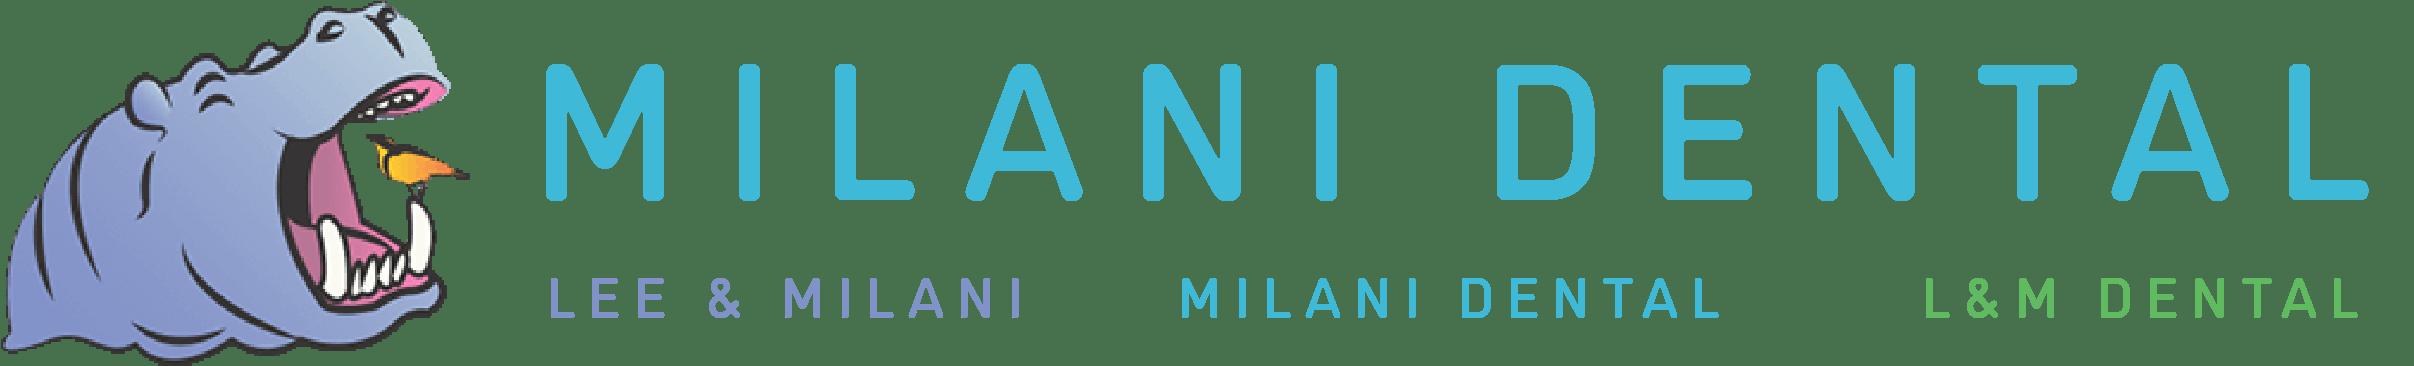 milani dental logo transparent